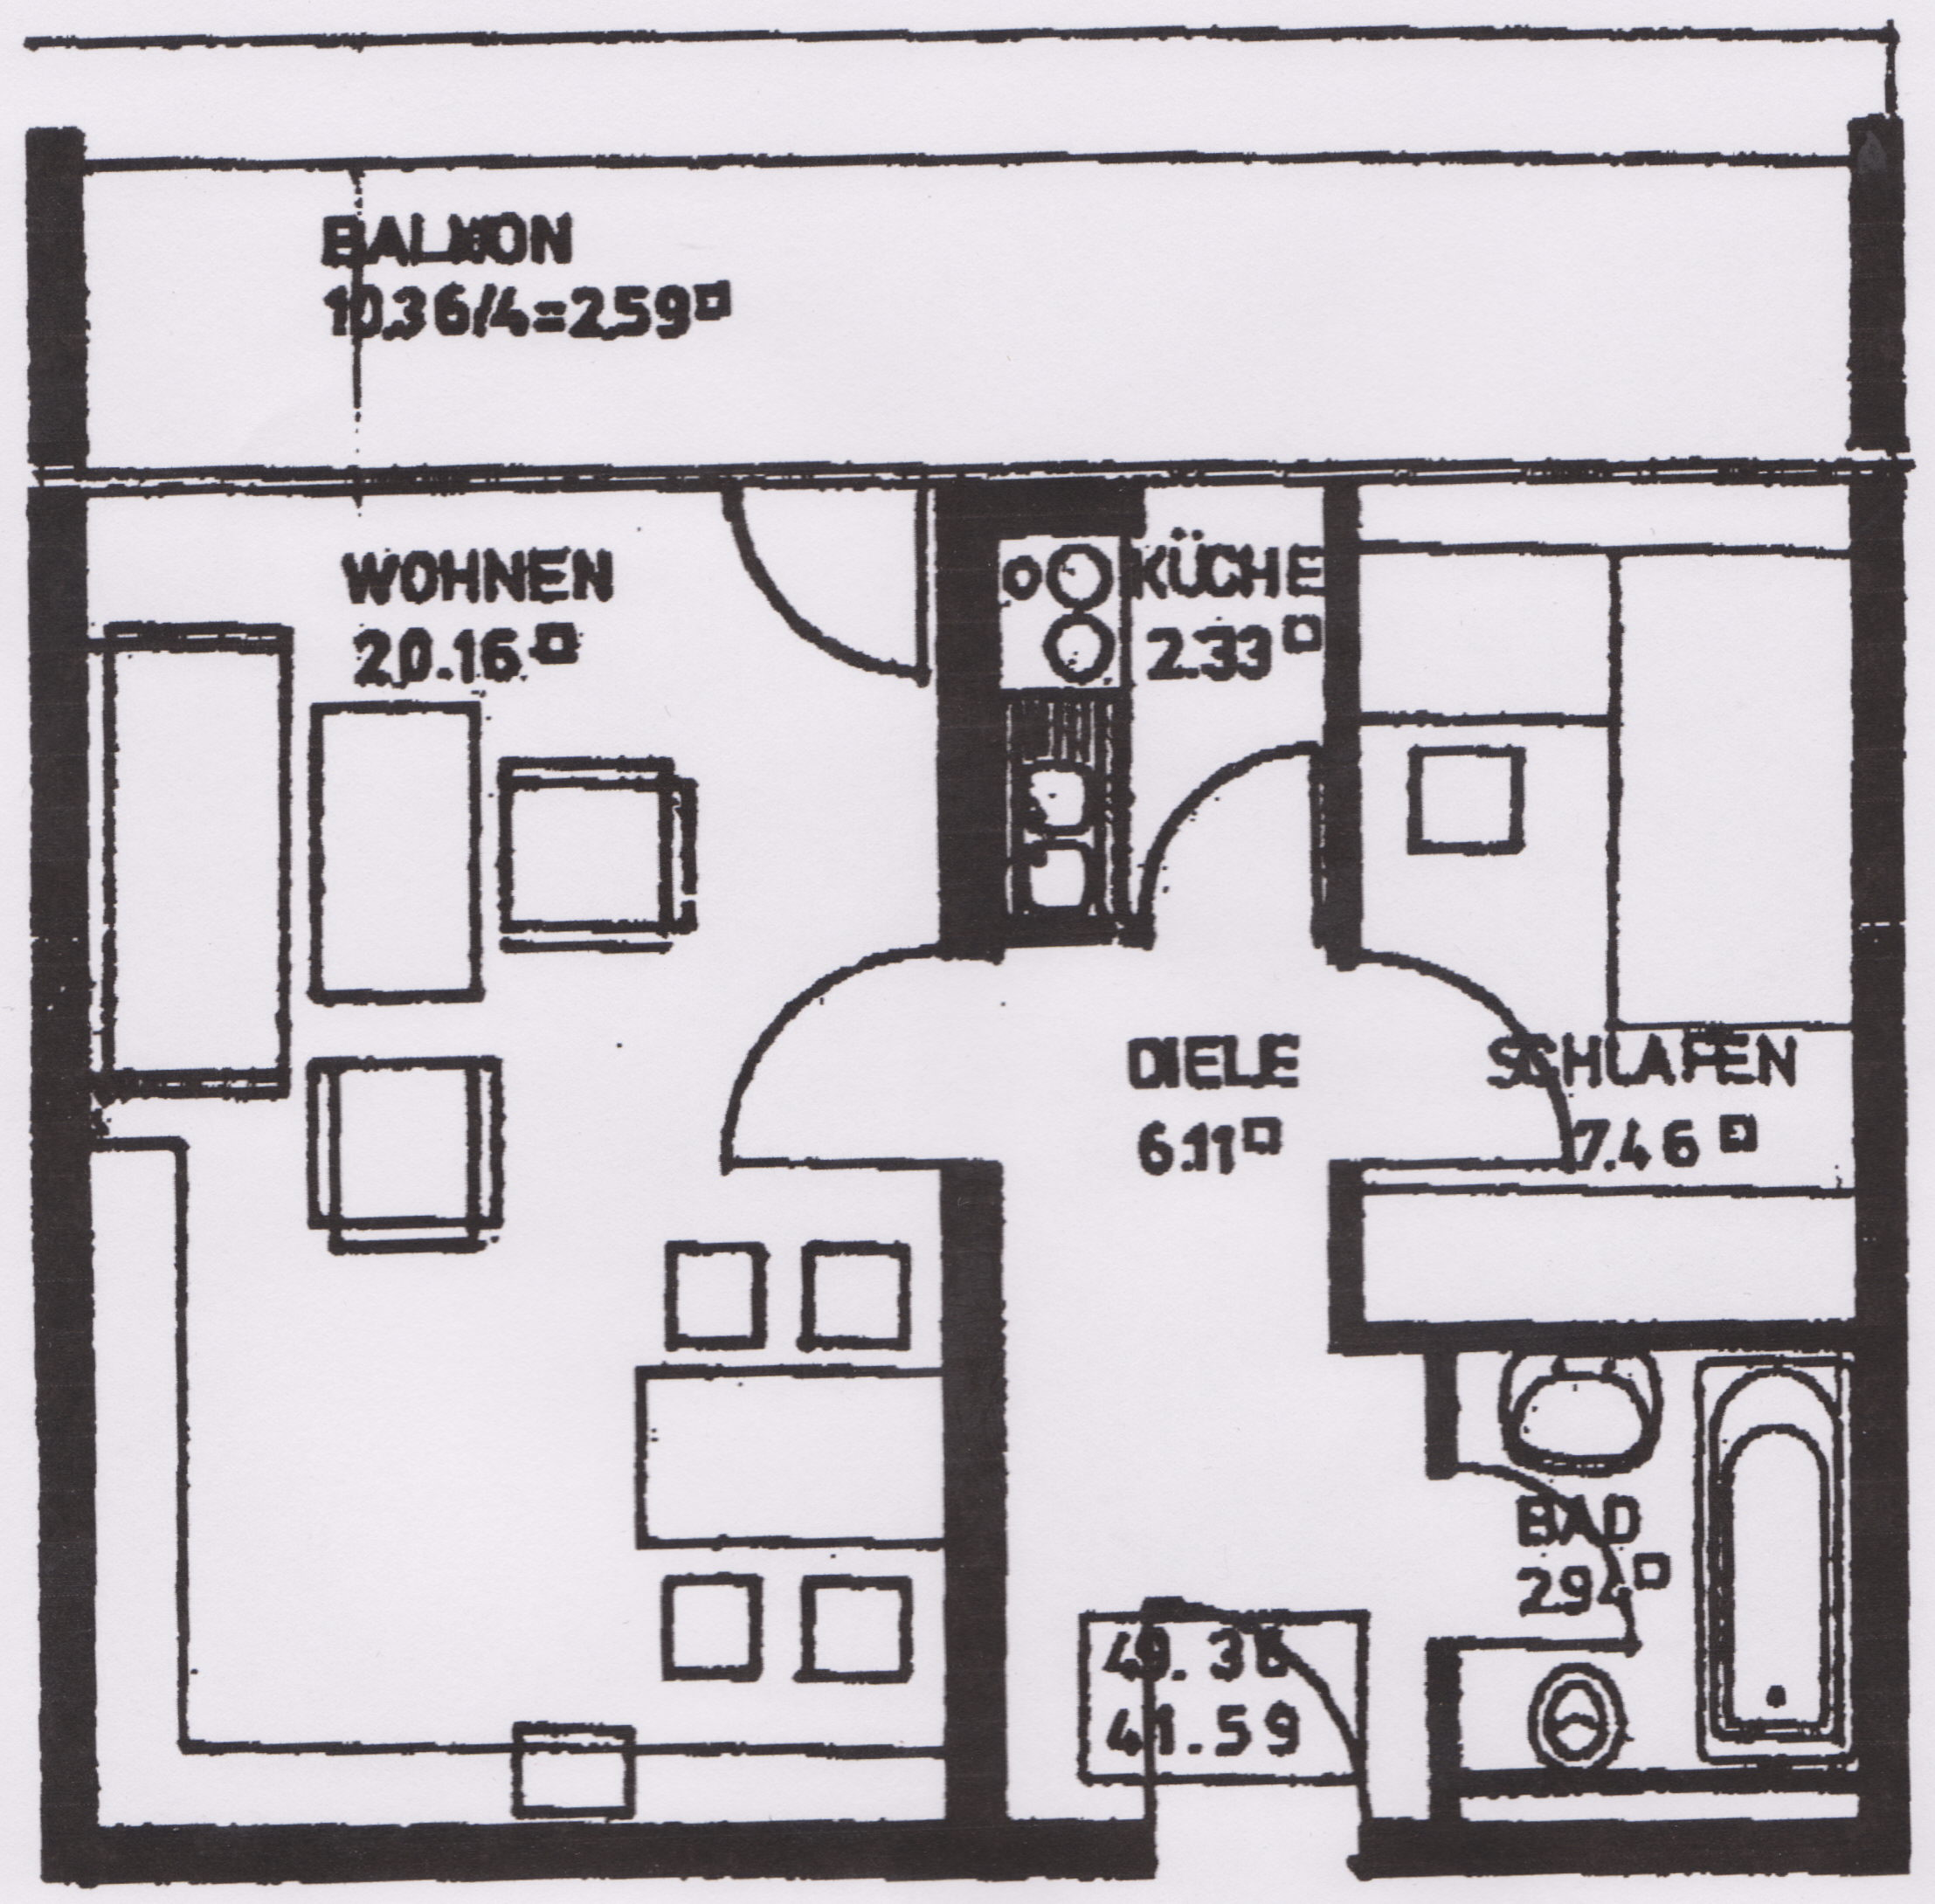 immobilien kleinanzeigen in stadl. Black Bedroom Furniture Sets. Home Design Ideas